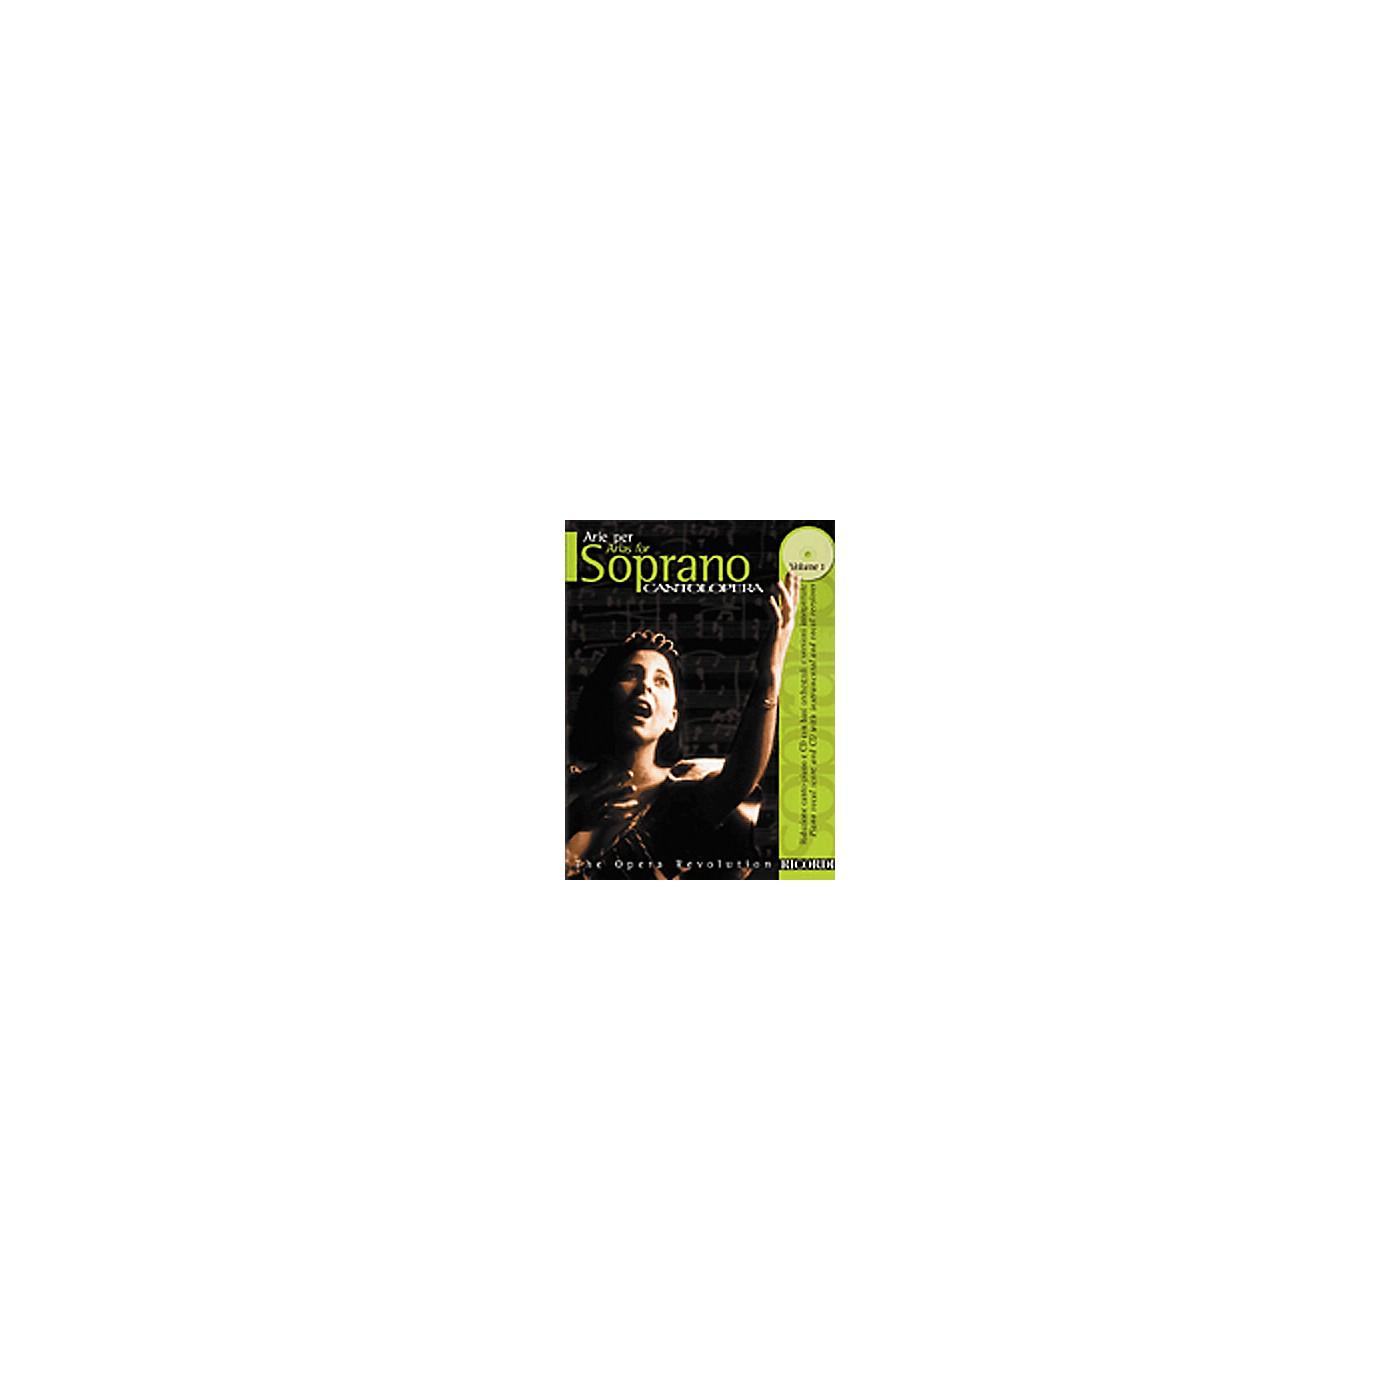 Hal Leonard Cantolopera Arias for Soprano - Volume 1 Book/CD thumbnail